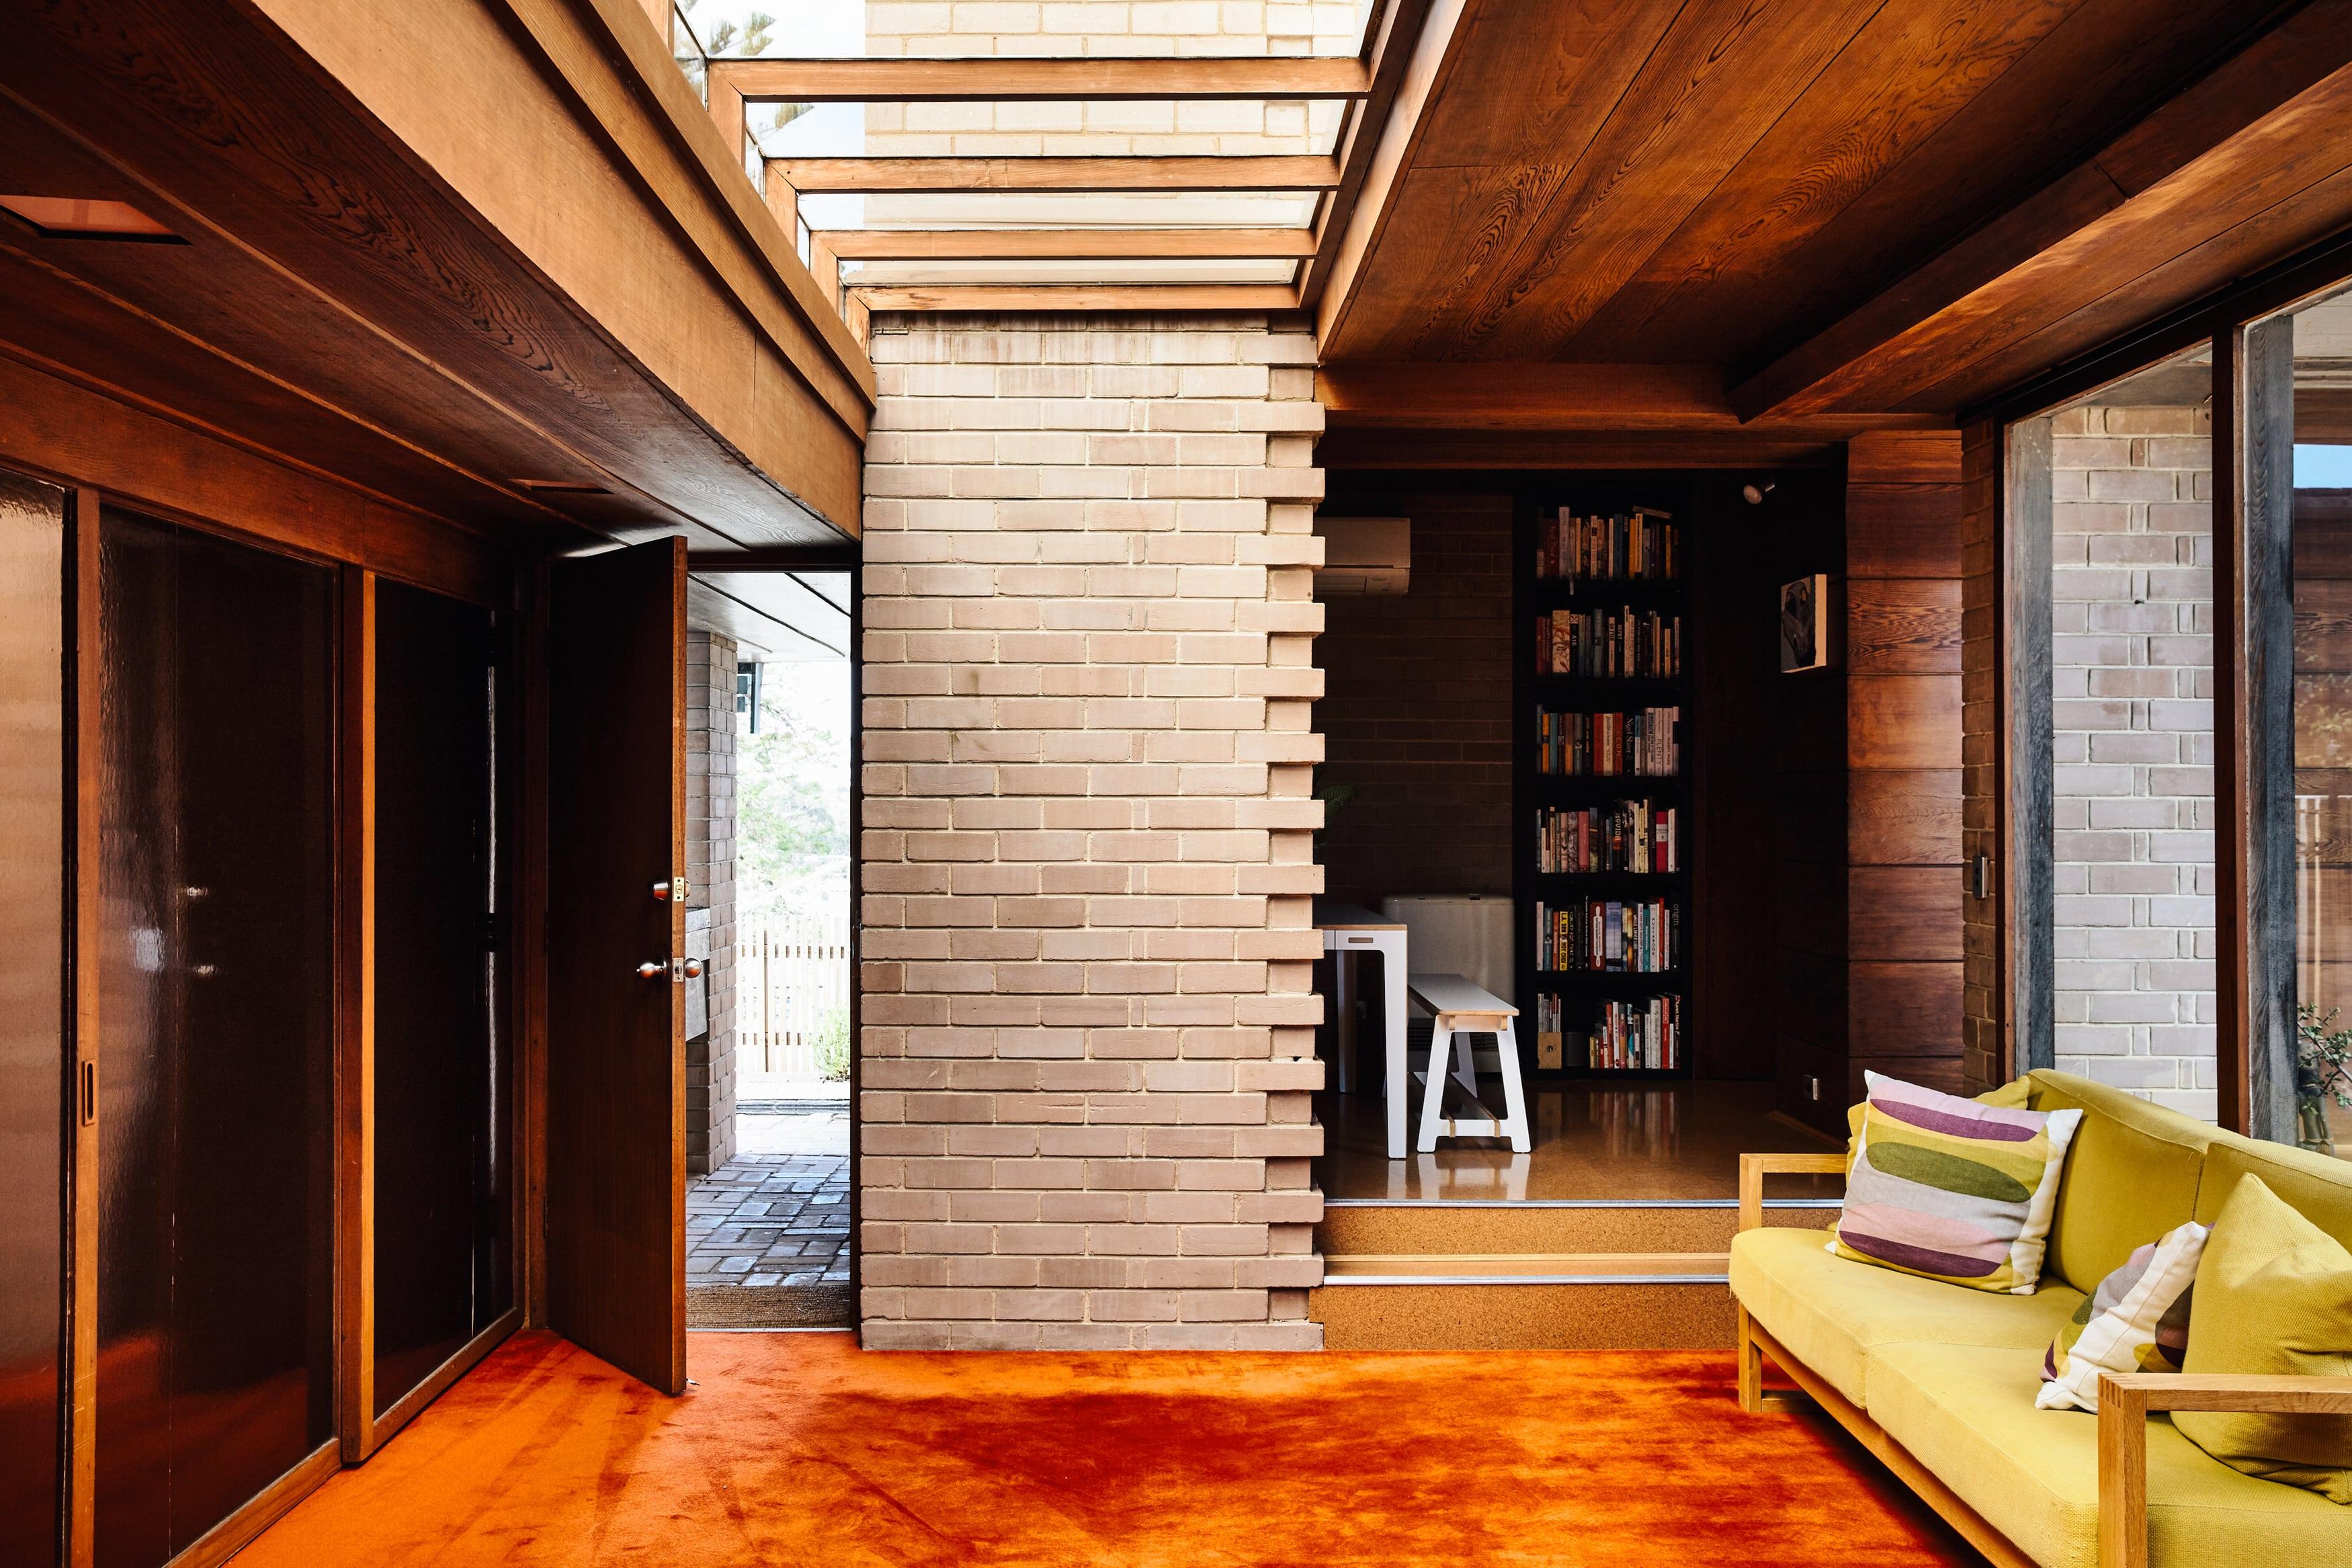 Gallery Of The Godsell House By David Godsell Local Australian Mid Century Modernist Design & Interiors Beaumaris, Vic Image 13